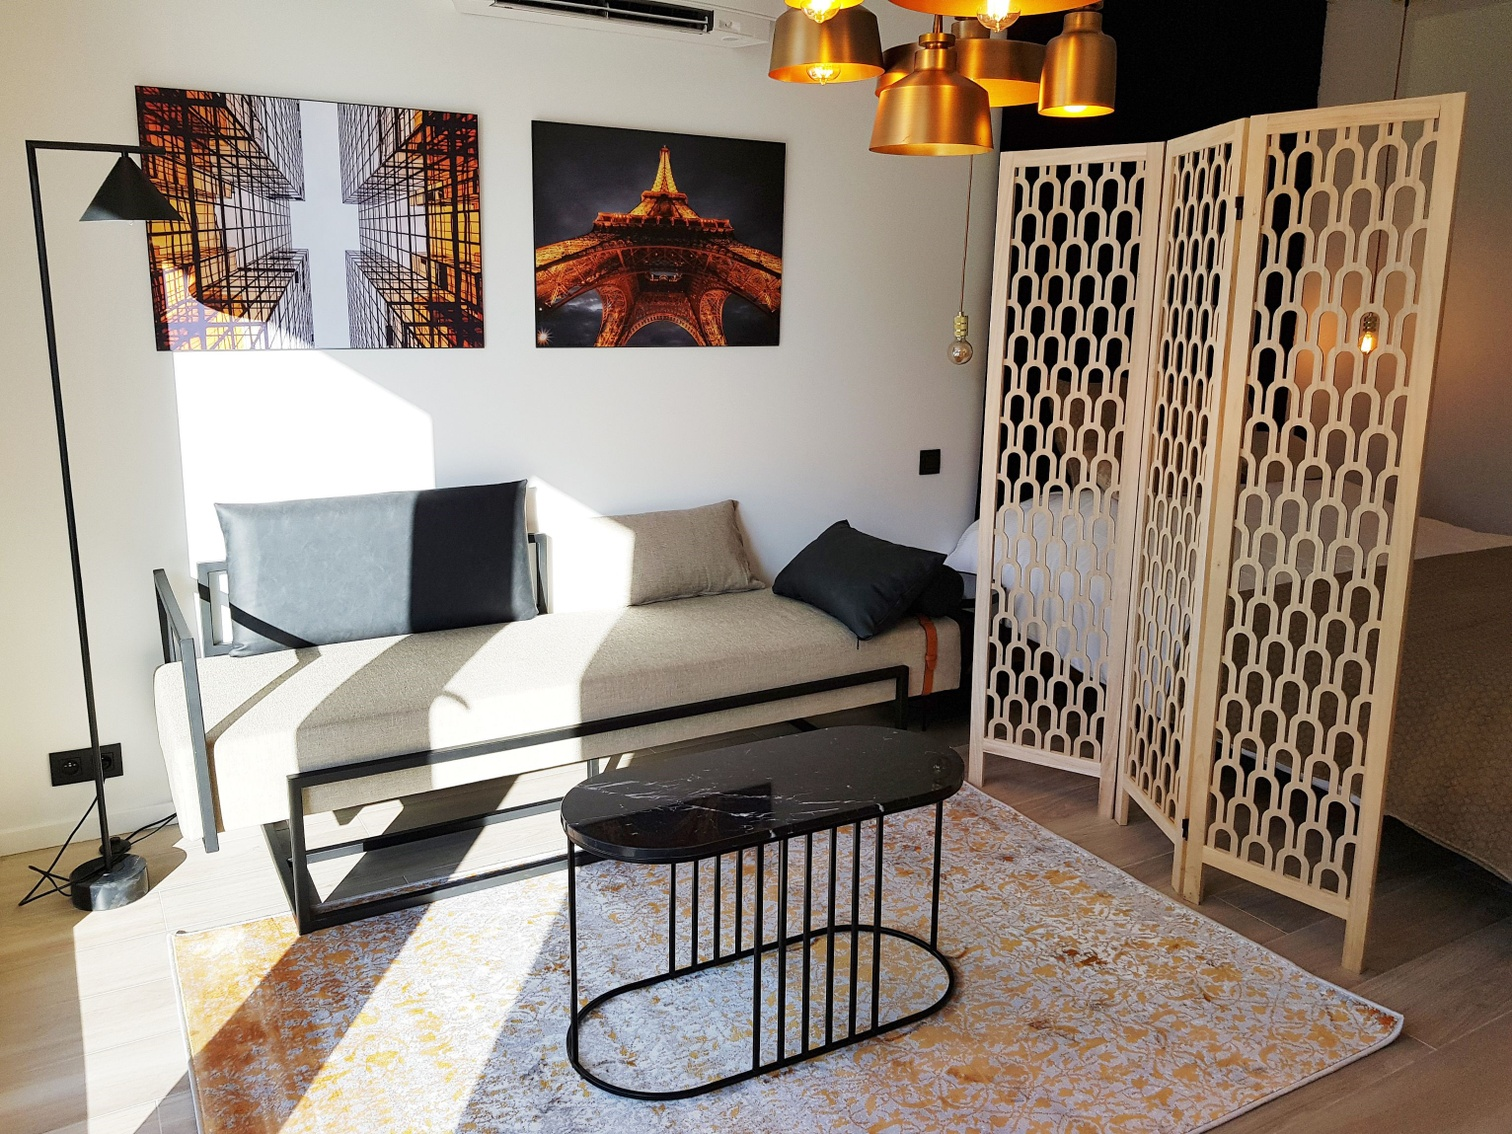 inrichting viersterren bed&breakfast - gastenkamer ArtDeco 2.0